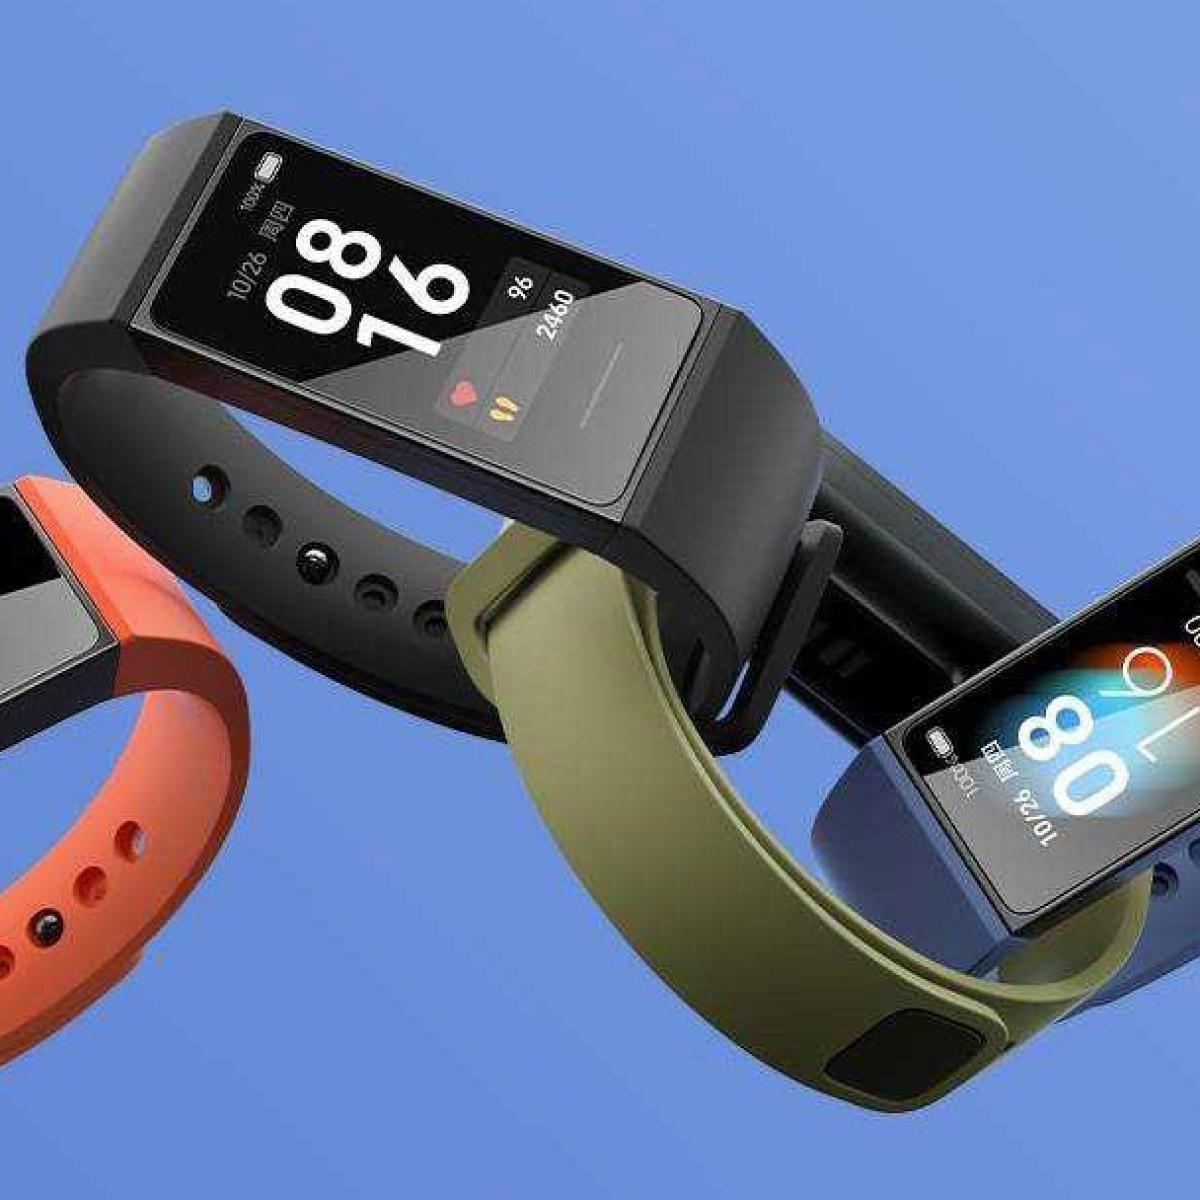 Alexa-powered Mi Smart Band 5 to check blood oxygen levels